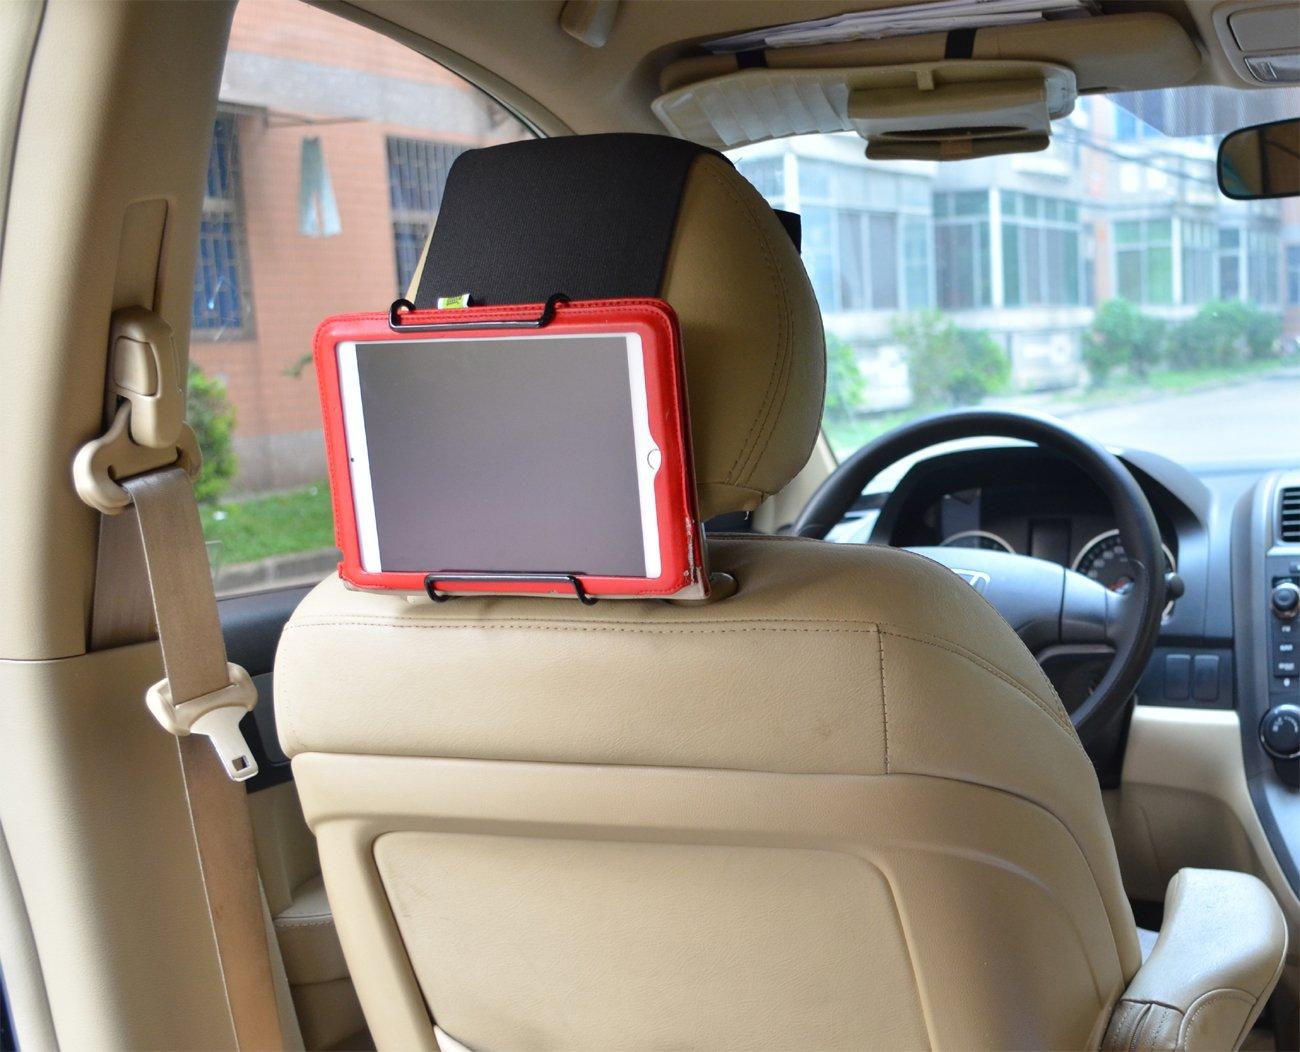 Bayan Universal Car Headrest Mount Holder for 6 Inch to 12.9 Inch Tablet PCs 6UHM_BK